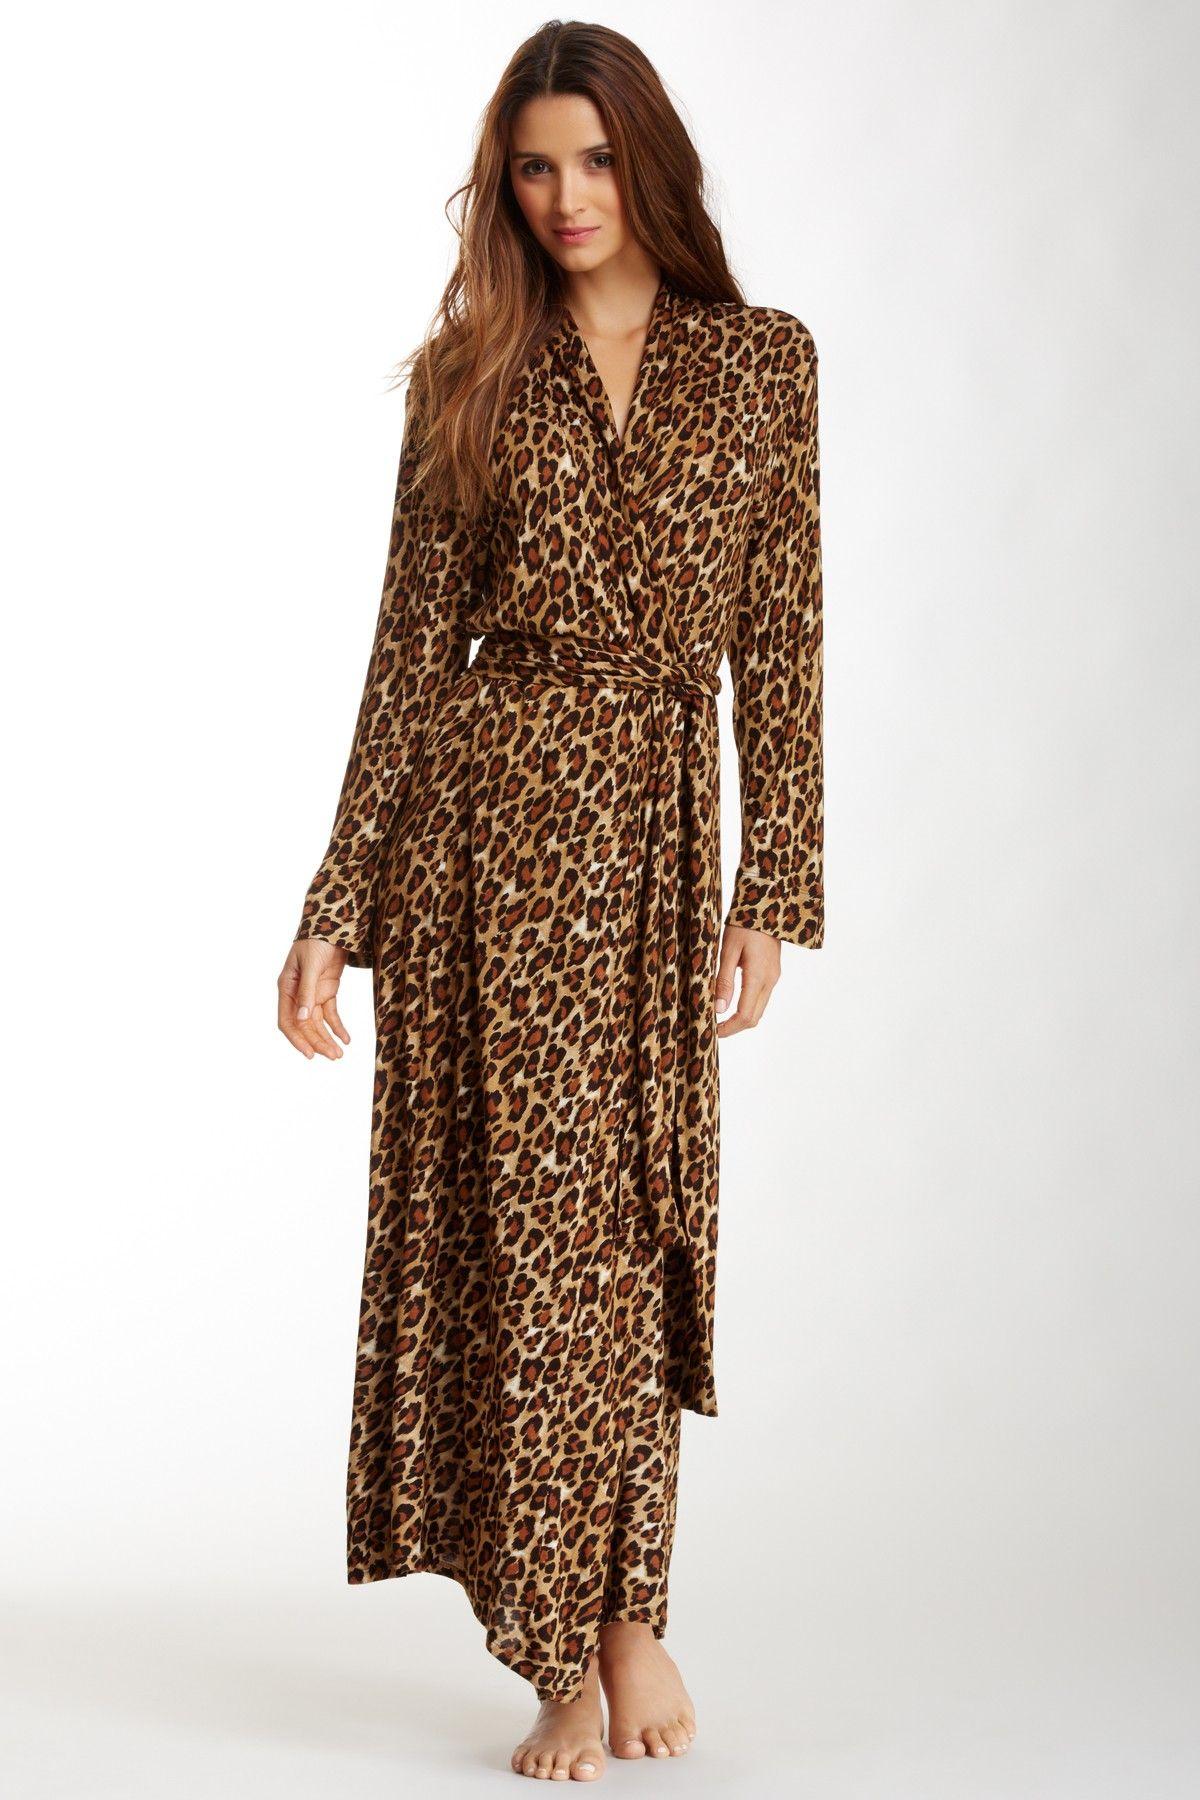 a4335bbbef23 Natori Animal Print Dressing Robe $84.97 $170.00 50% Off Natori | Animal  Print Dressing Robe | Nordstrom Rack